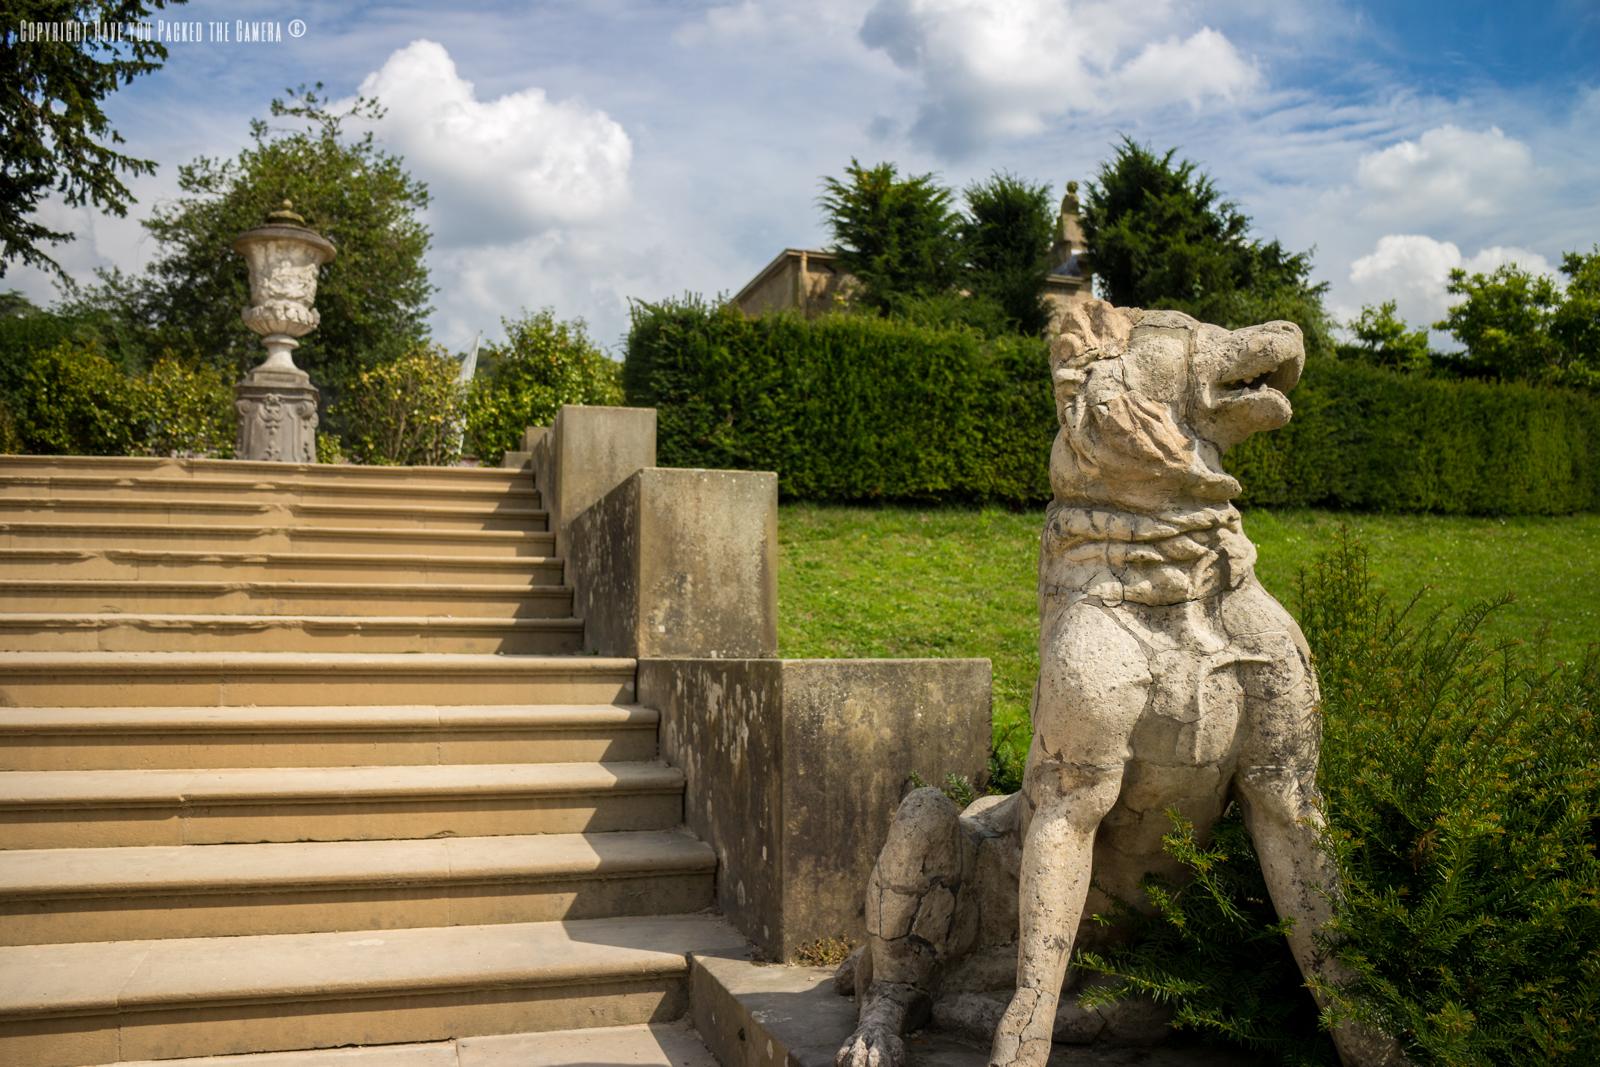 Chatsworth Estate and Gardens in the Peak District, Derbyshire